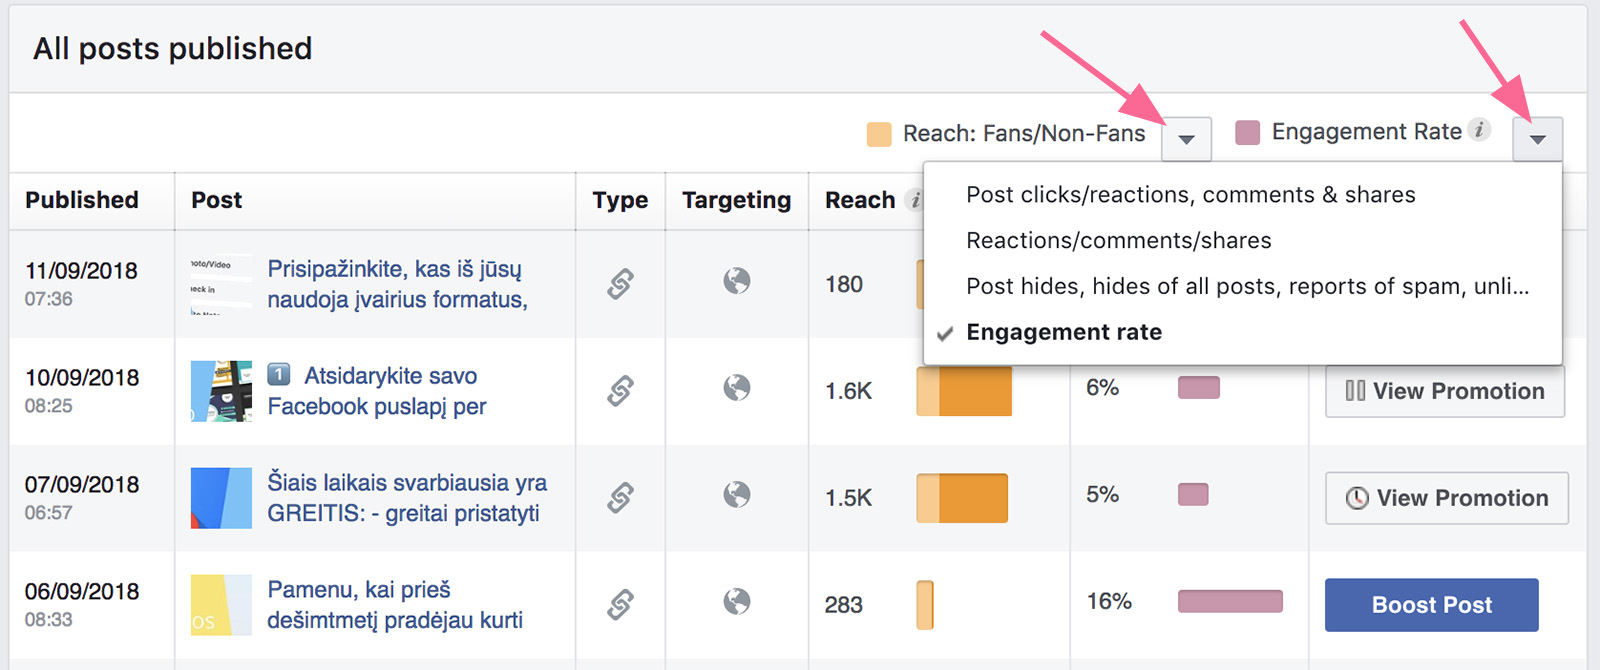 Facebook reakcijų procentas (engagemtn Rate)